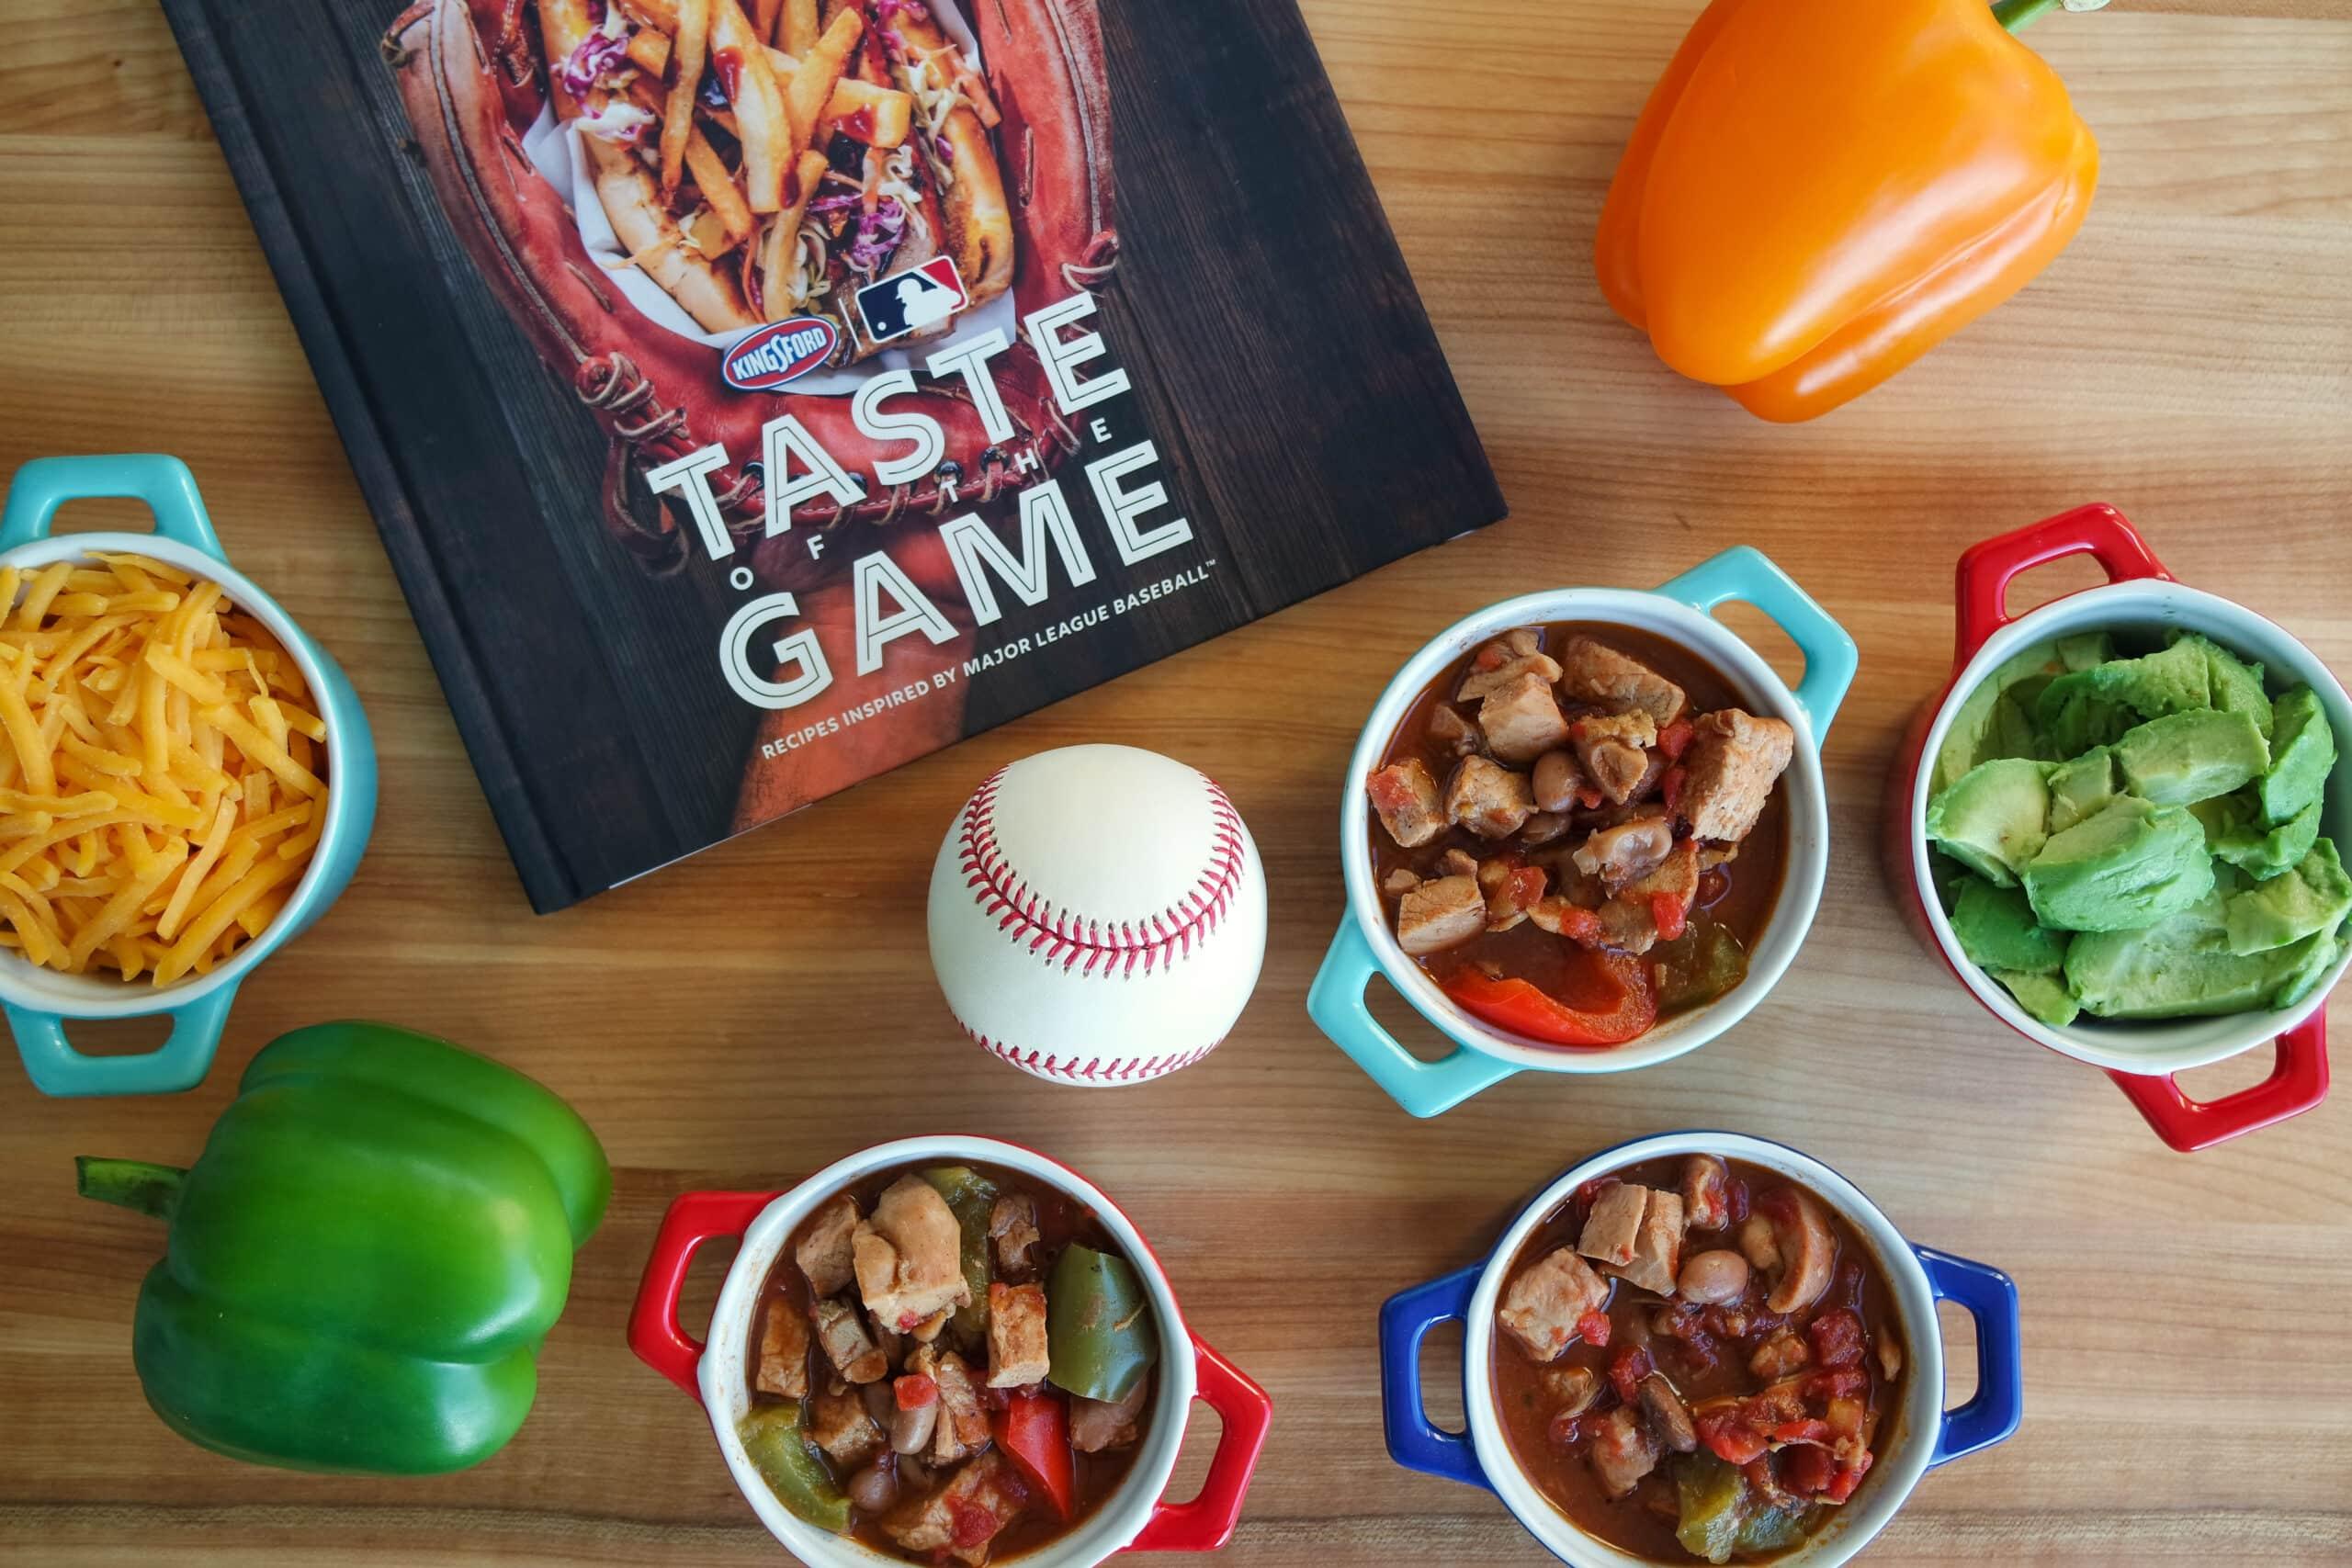 Kingsford Taste of the Game Smoky Rattlesnake Chili